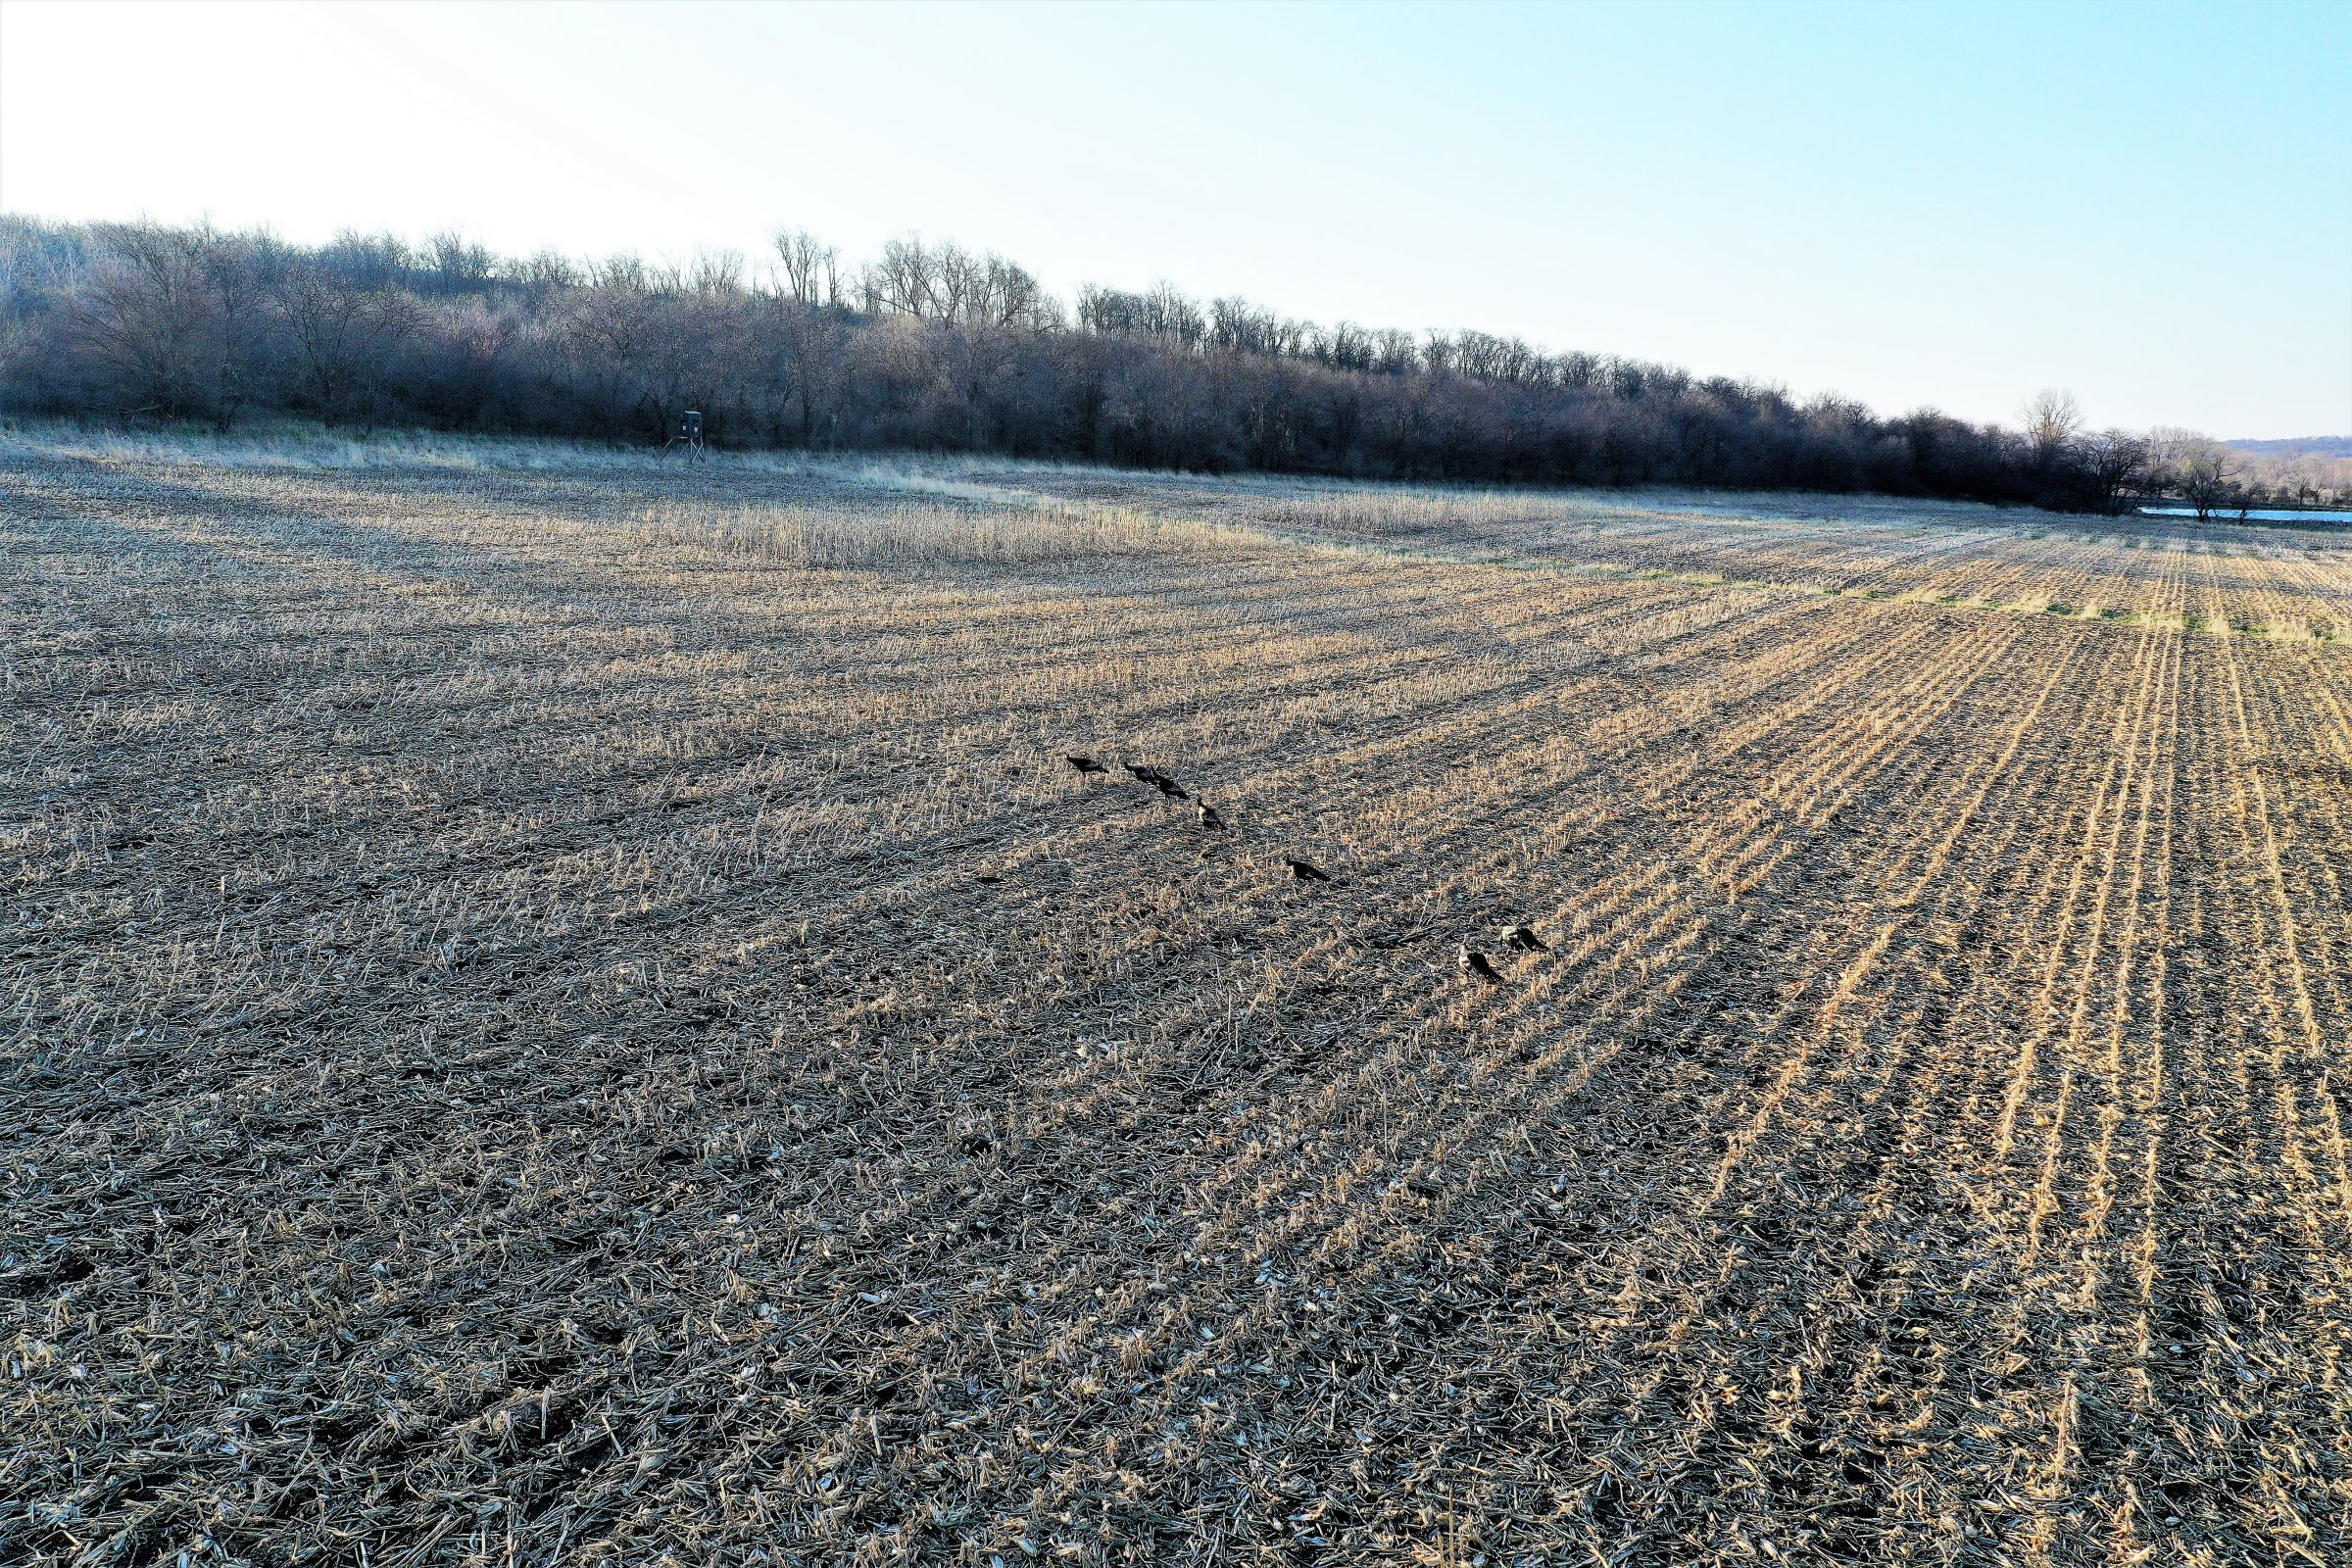 development-land-madison-county-iowa-267-acres-listing-number-15200-3-2020-10-06-184531.jpg